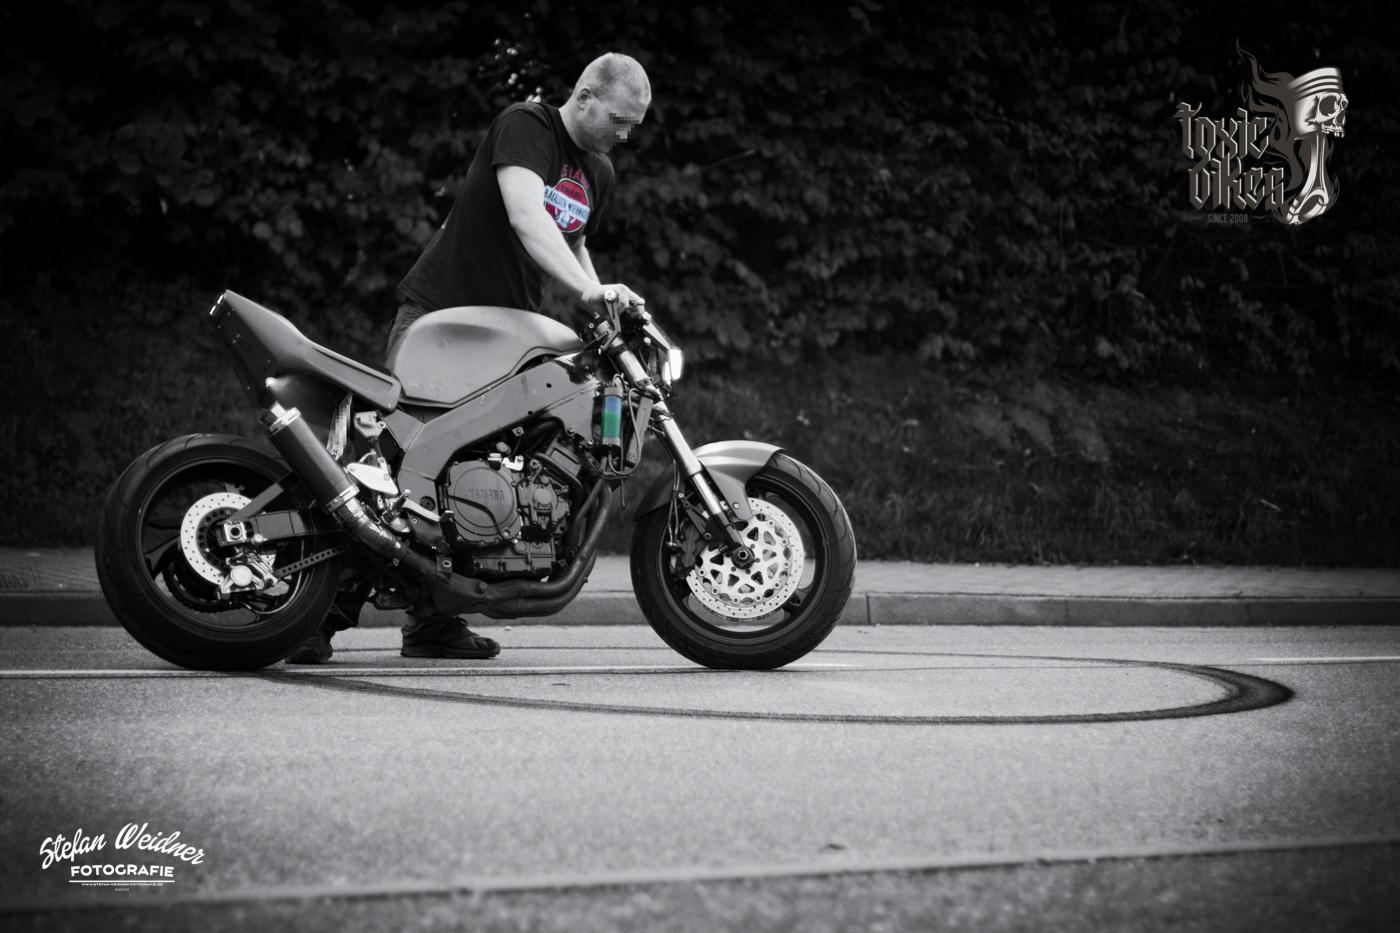 c-Stefan-Weidner-Fotografie_Toxic-Bikes-Hohenfelde_15-08-2015_IMG_3989.jpg